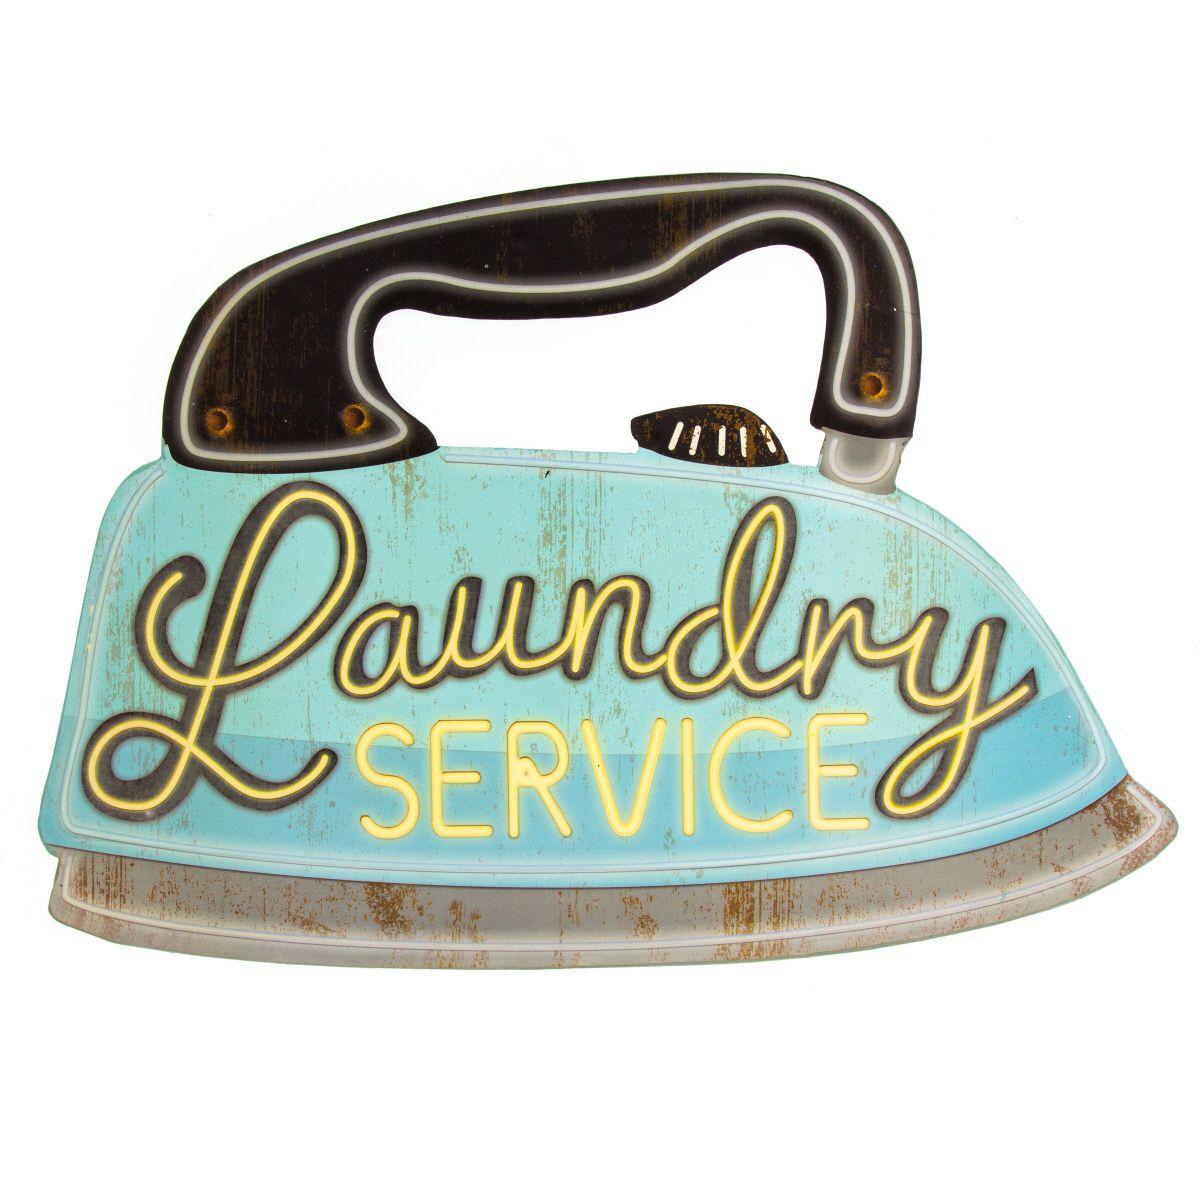 Laundry Room Tin Signs Laundry Service Iron Embossed Tin Sign_D  Laundry Rooms Laundry